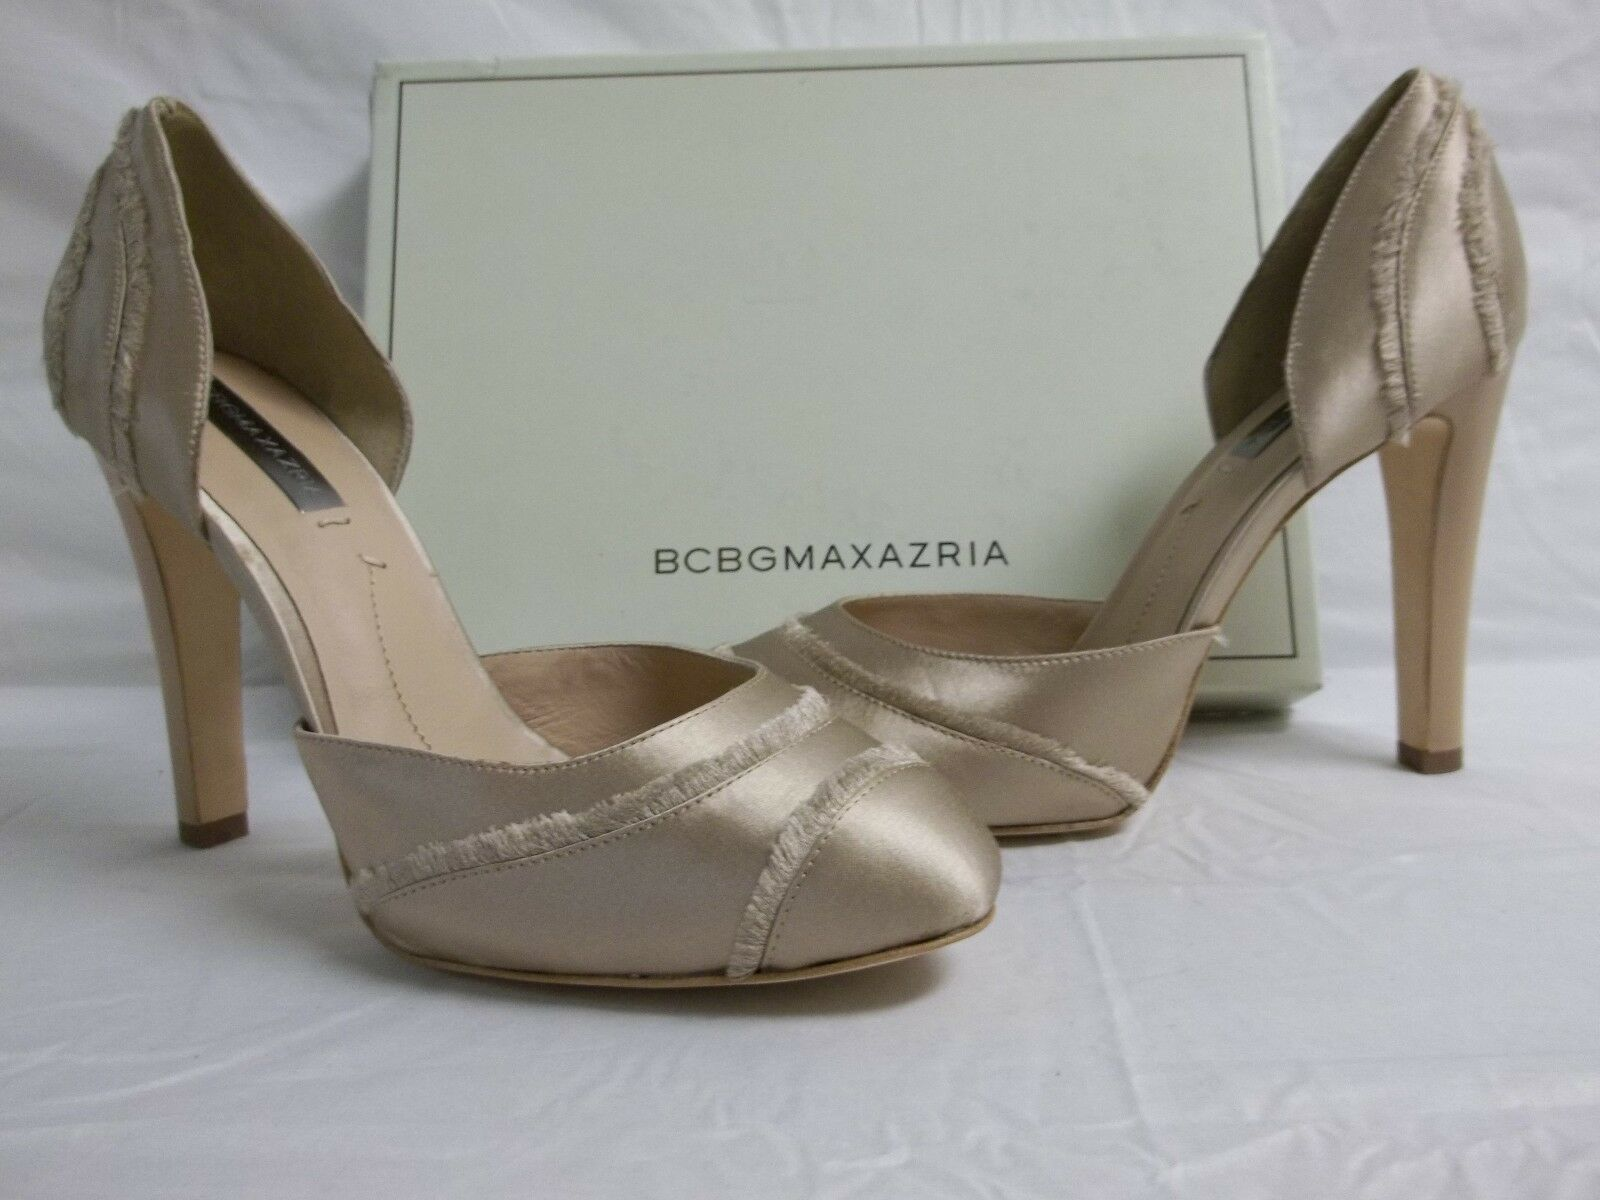 BCBG Max Azria Größe 9 M Amaris Blush Satin Pumps NEU Damenschuhe Schuhes